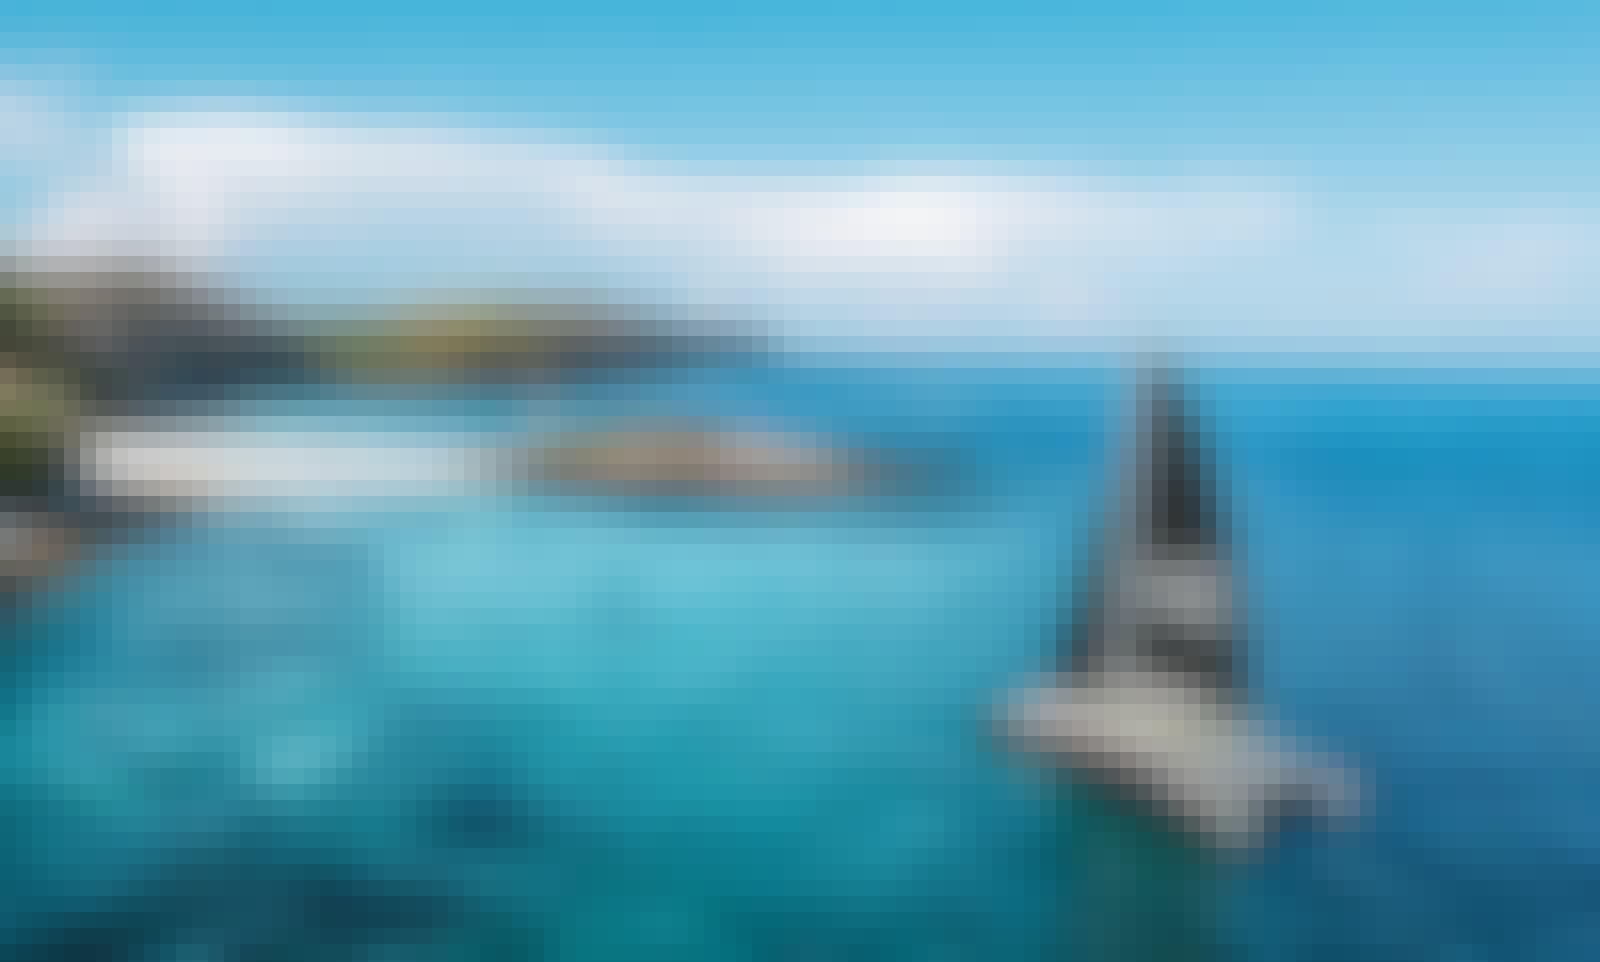 Stunning 74' Ocean Voyager Catamaran -  Private Cruise in Phuket Islands!